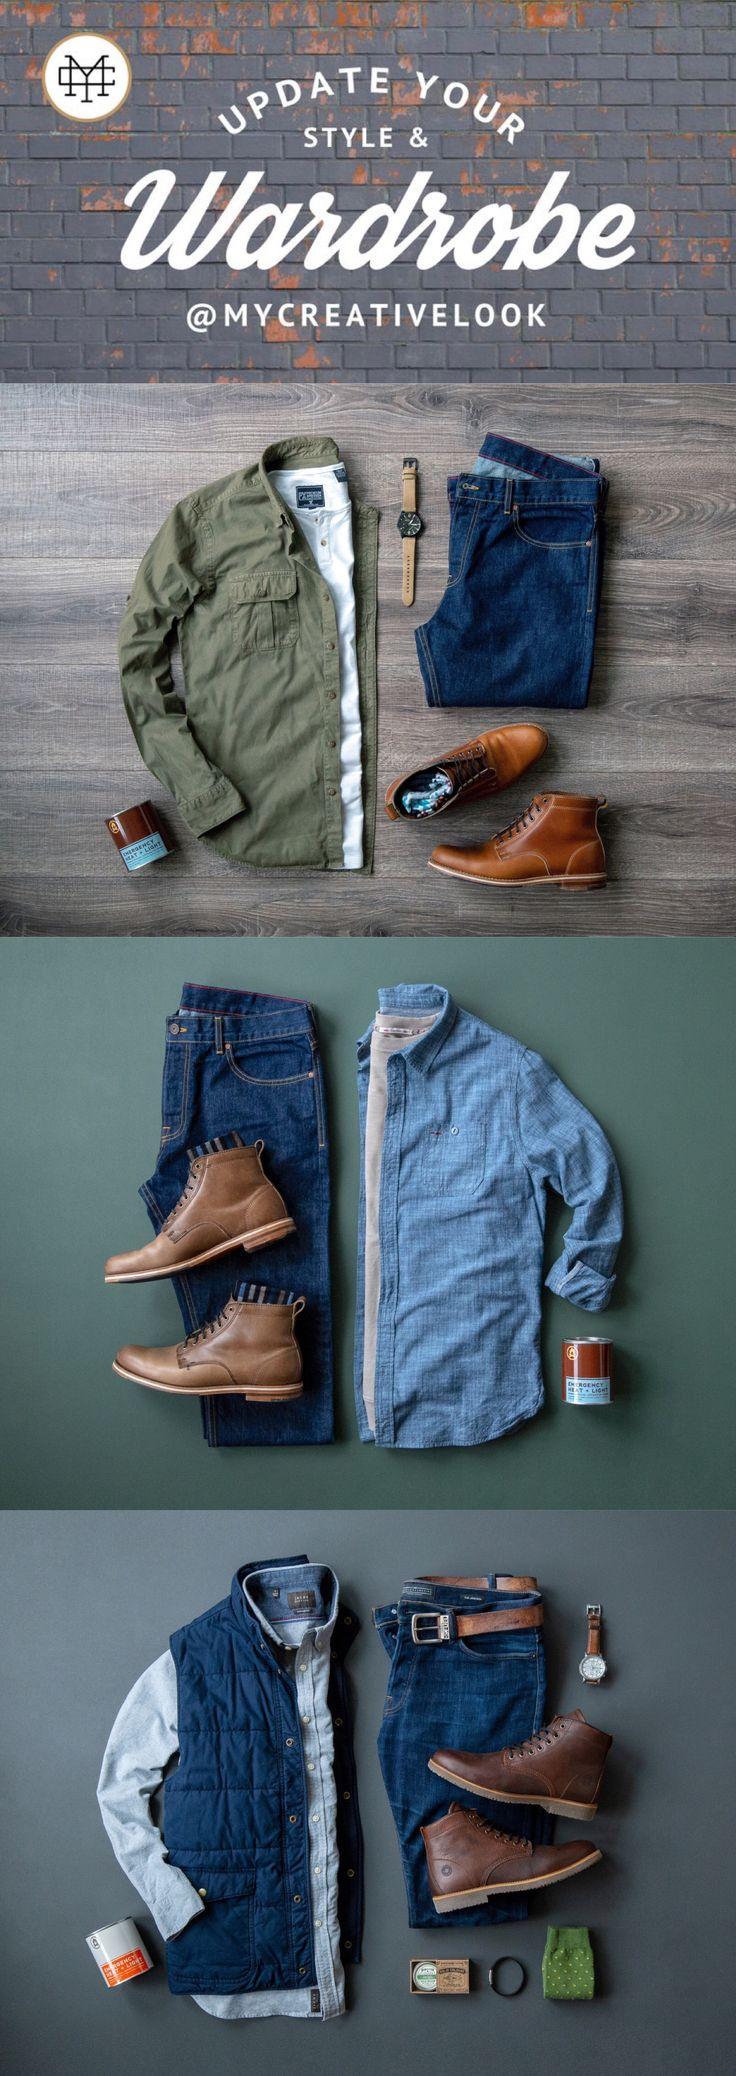 MyCreativeLook - Fashion, Style & Inspiration - konstant castle